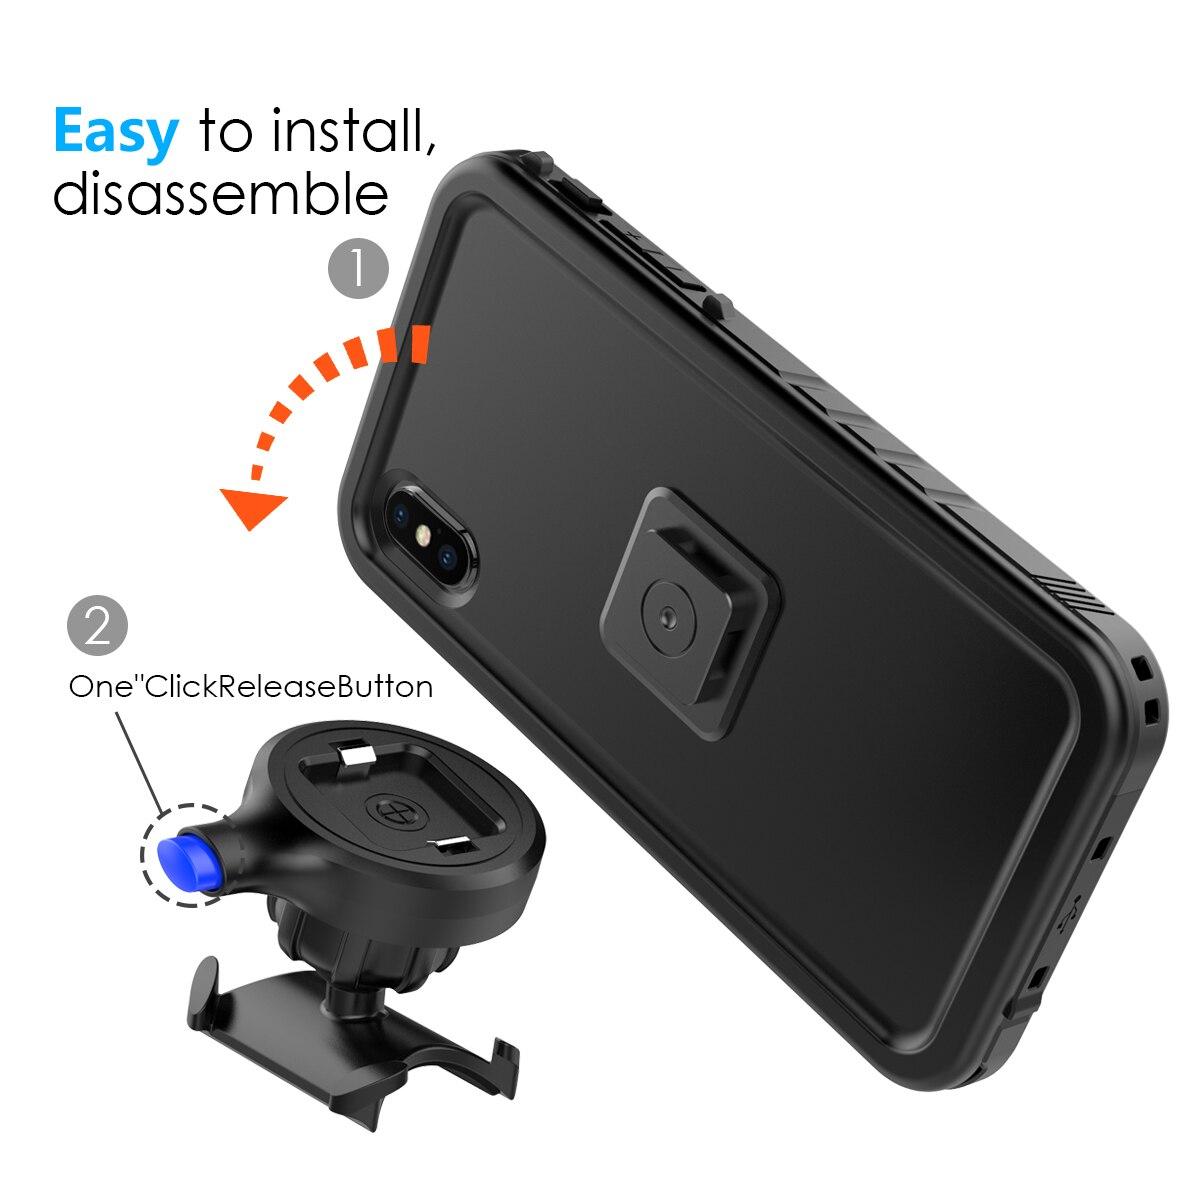 Image 4 - Bike Mount Phone Case For iPhone Xs Max Case Rotating Bicycle Handlebar Mount Holder phone cover For iPhone XS Max ShockproofFitted Cases   -